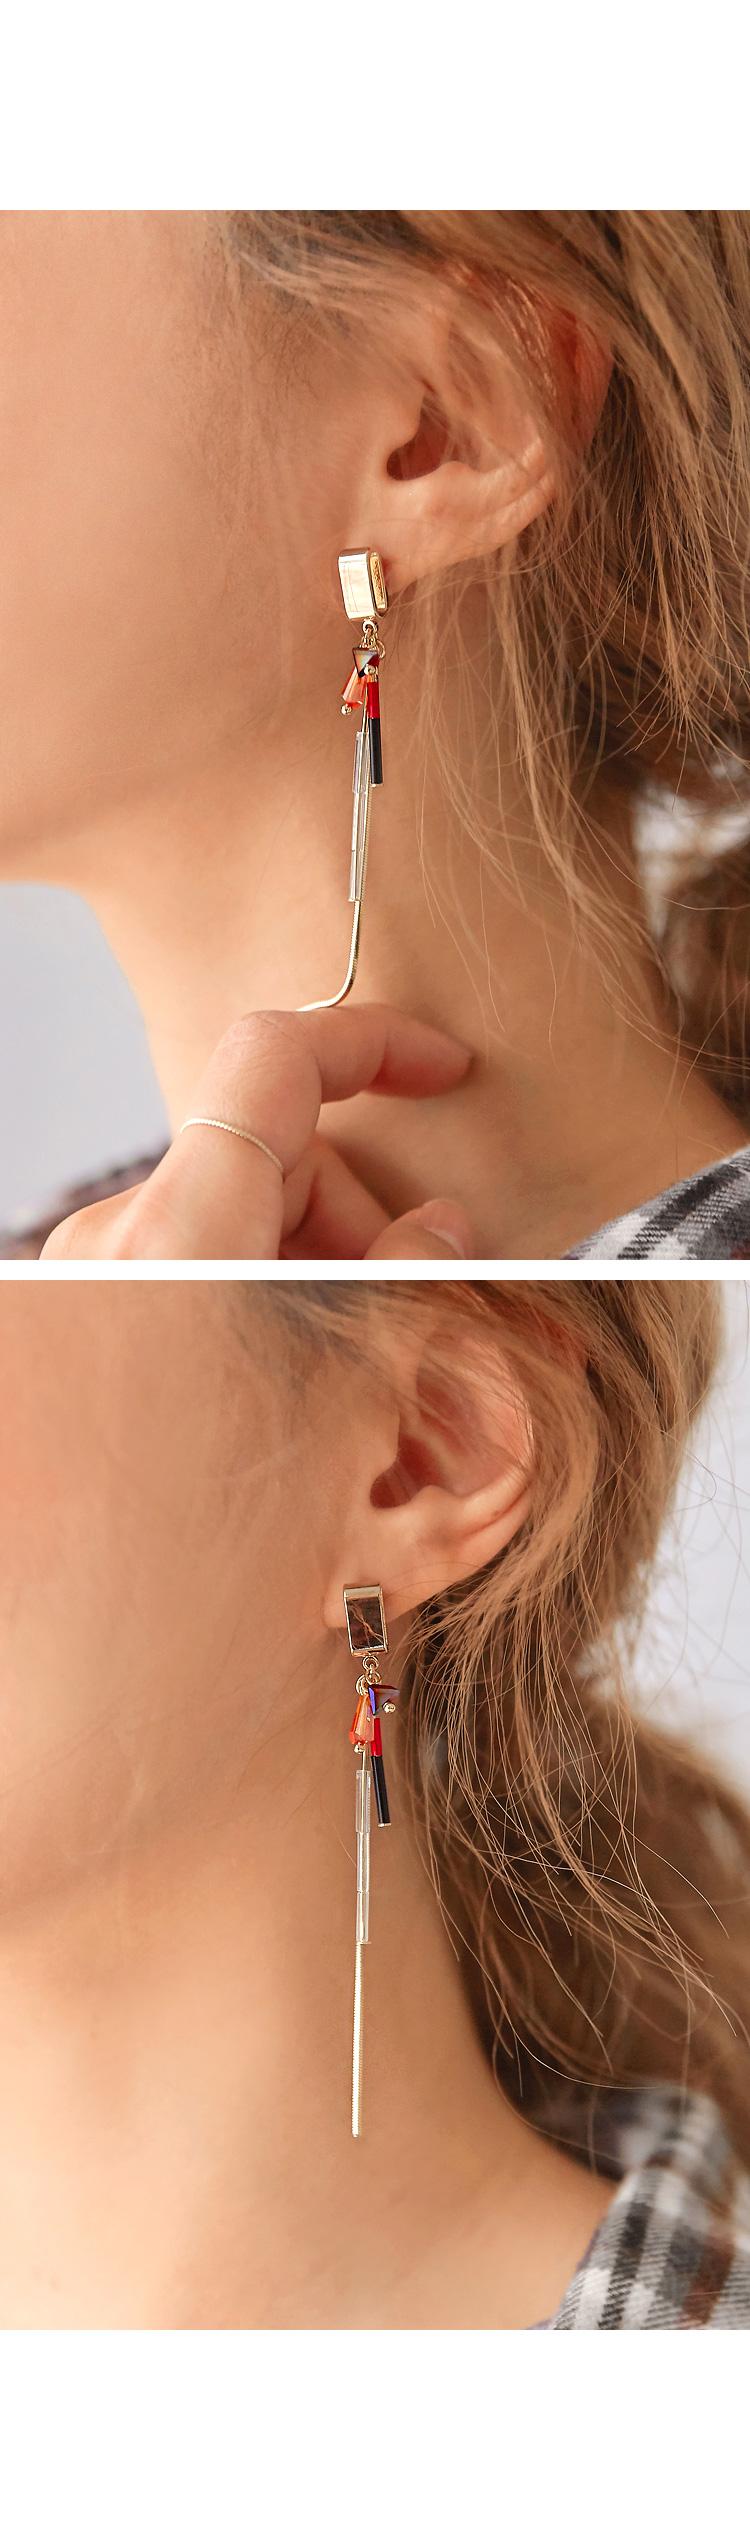 FUSE BEADS UNBAL DROP EARRING